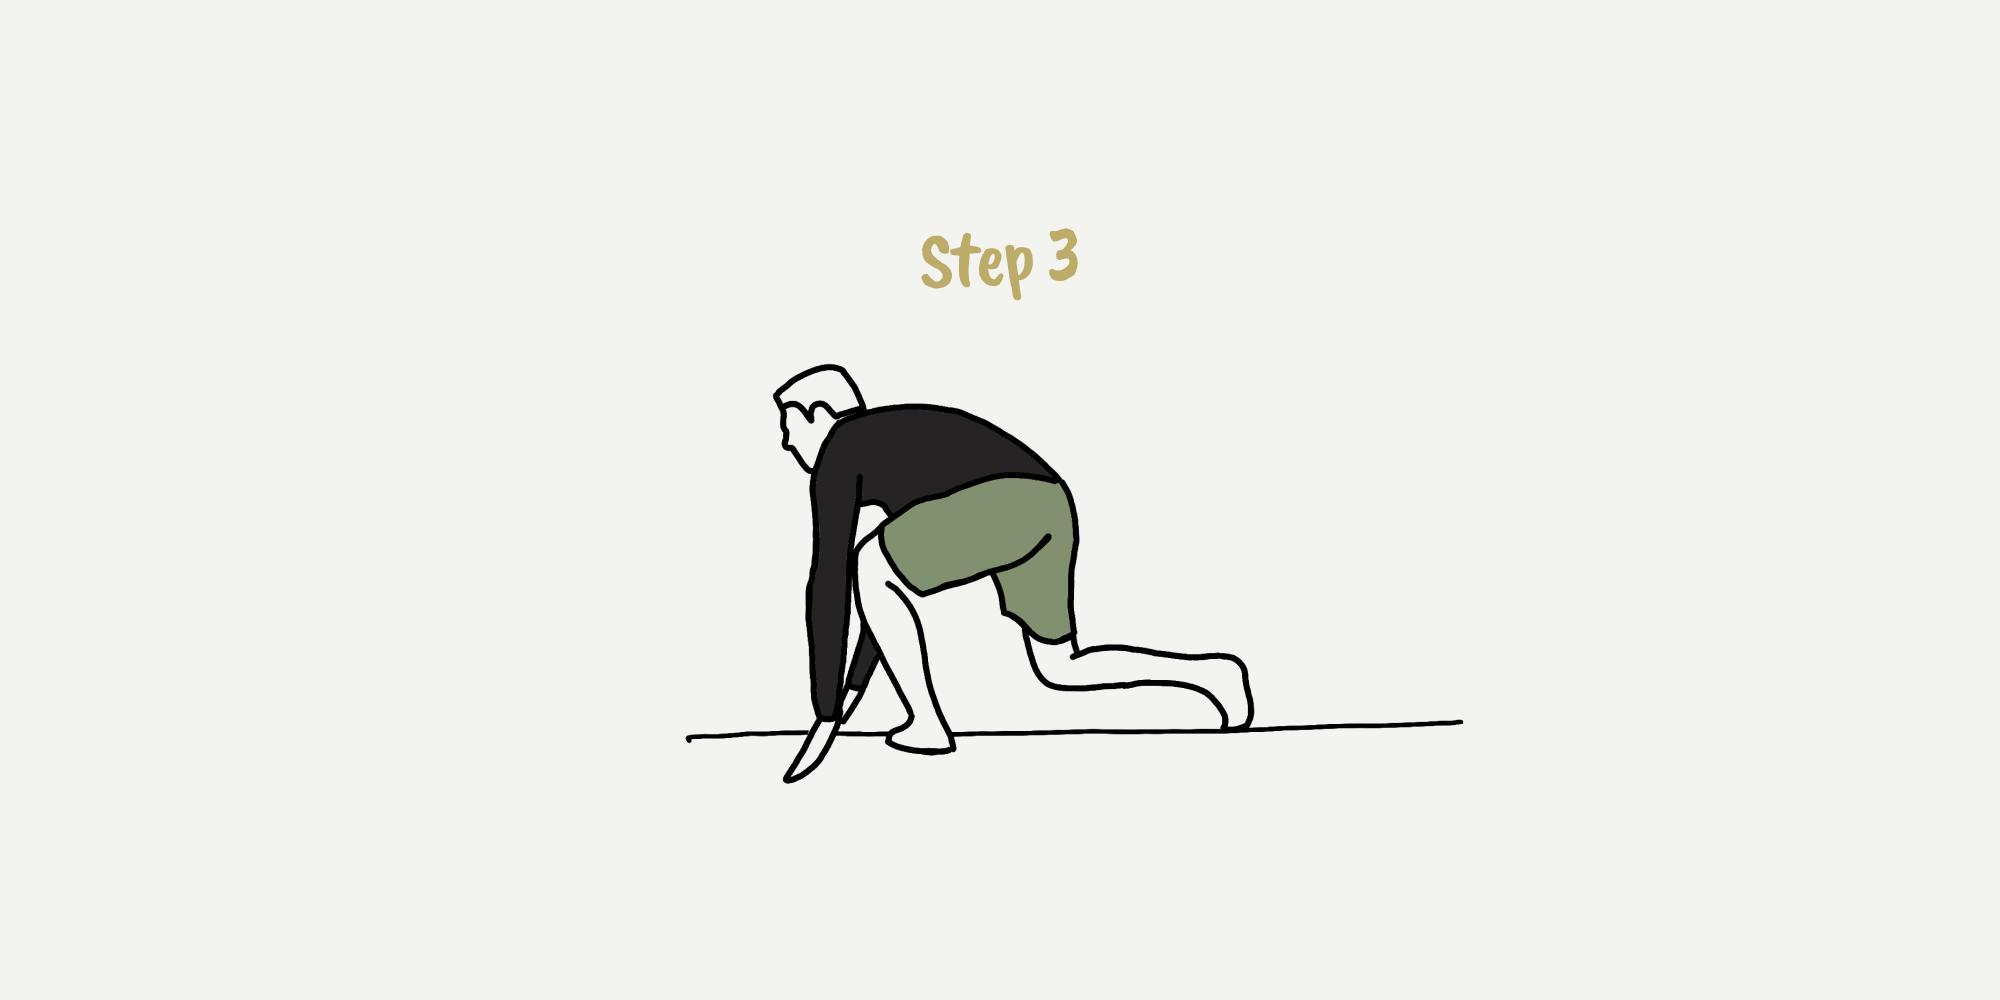 Standard Pop Up - Step 3